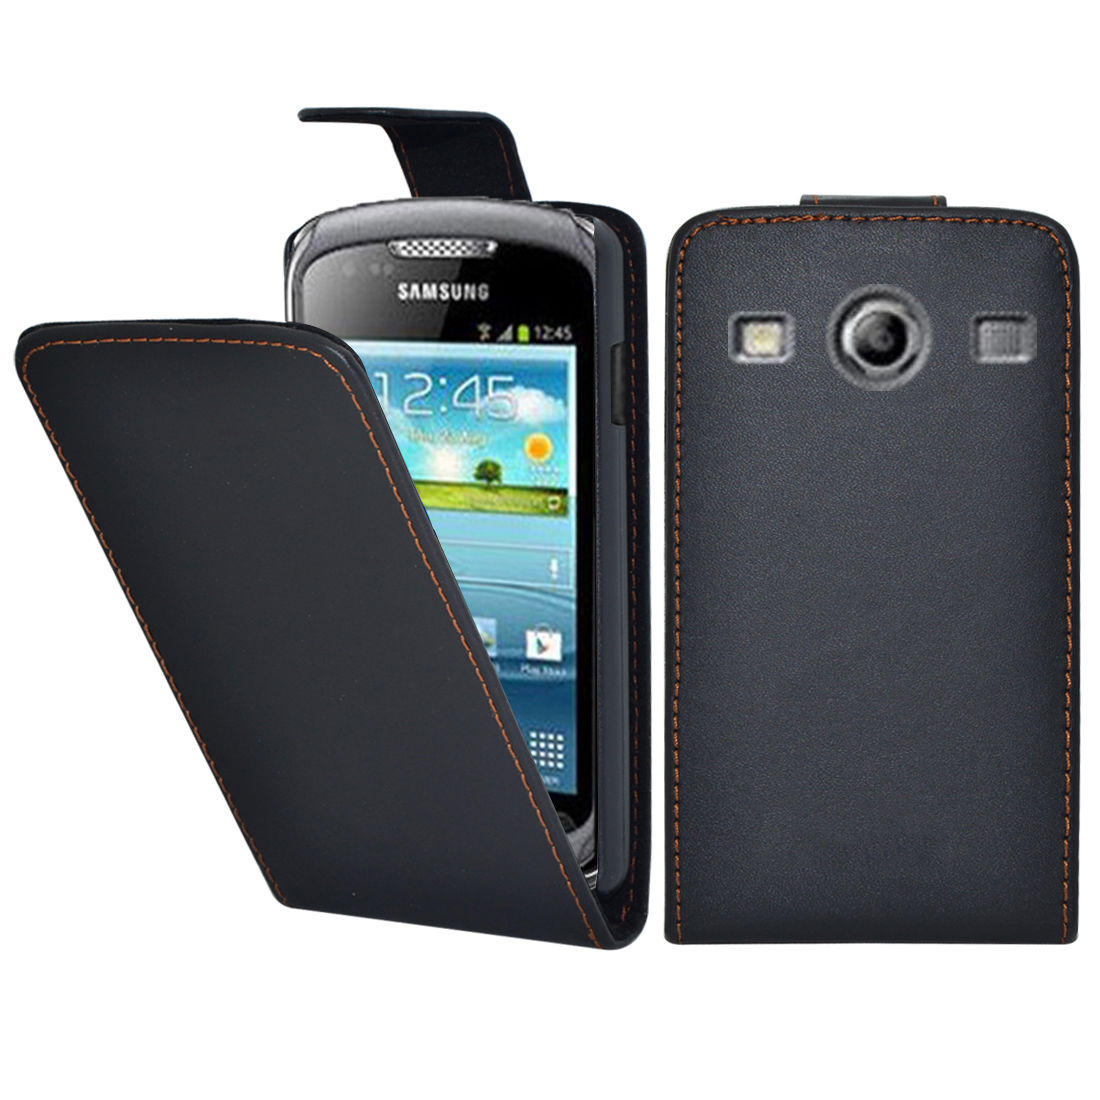 Pouzdro FLIP pro Samsung Galaxy Xcover 2 S7710 černé